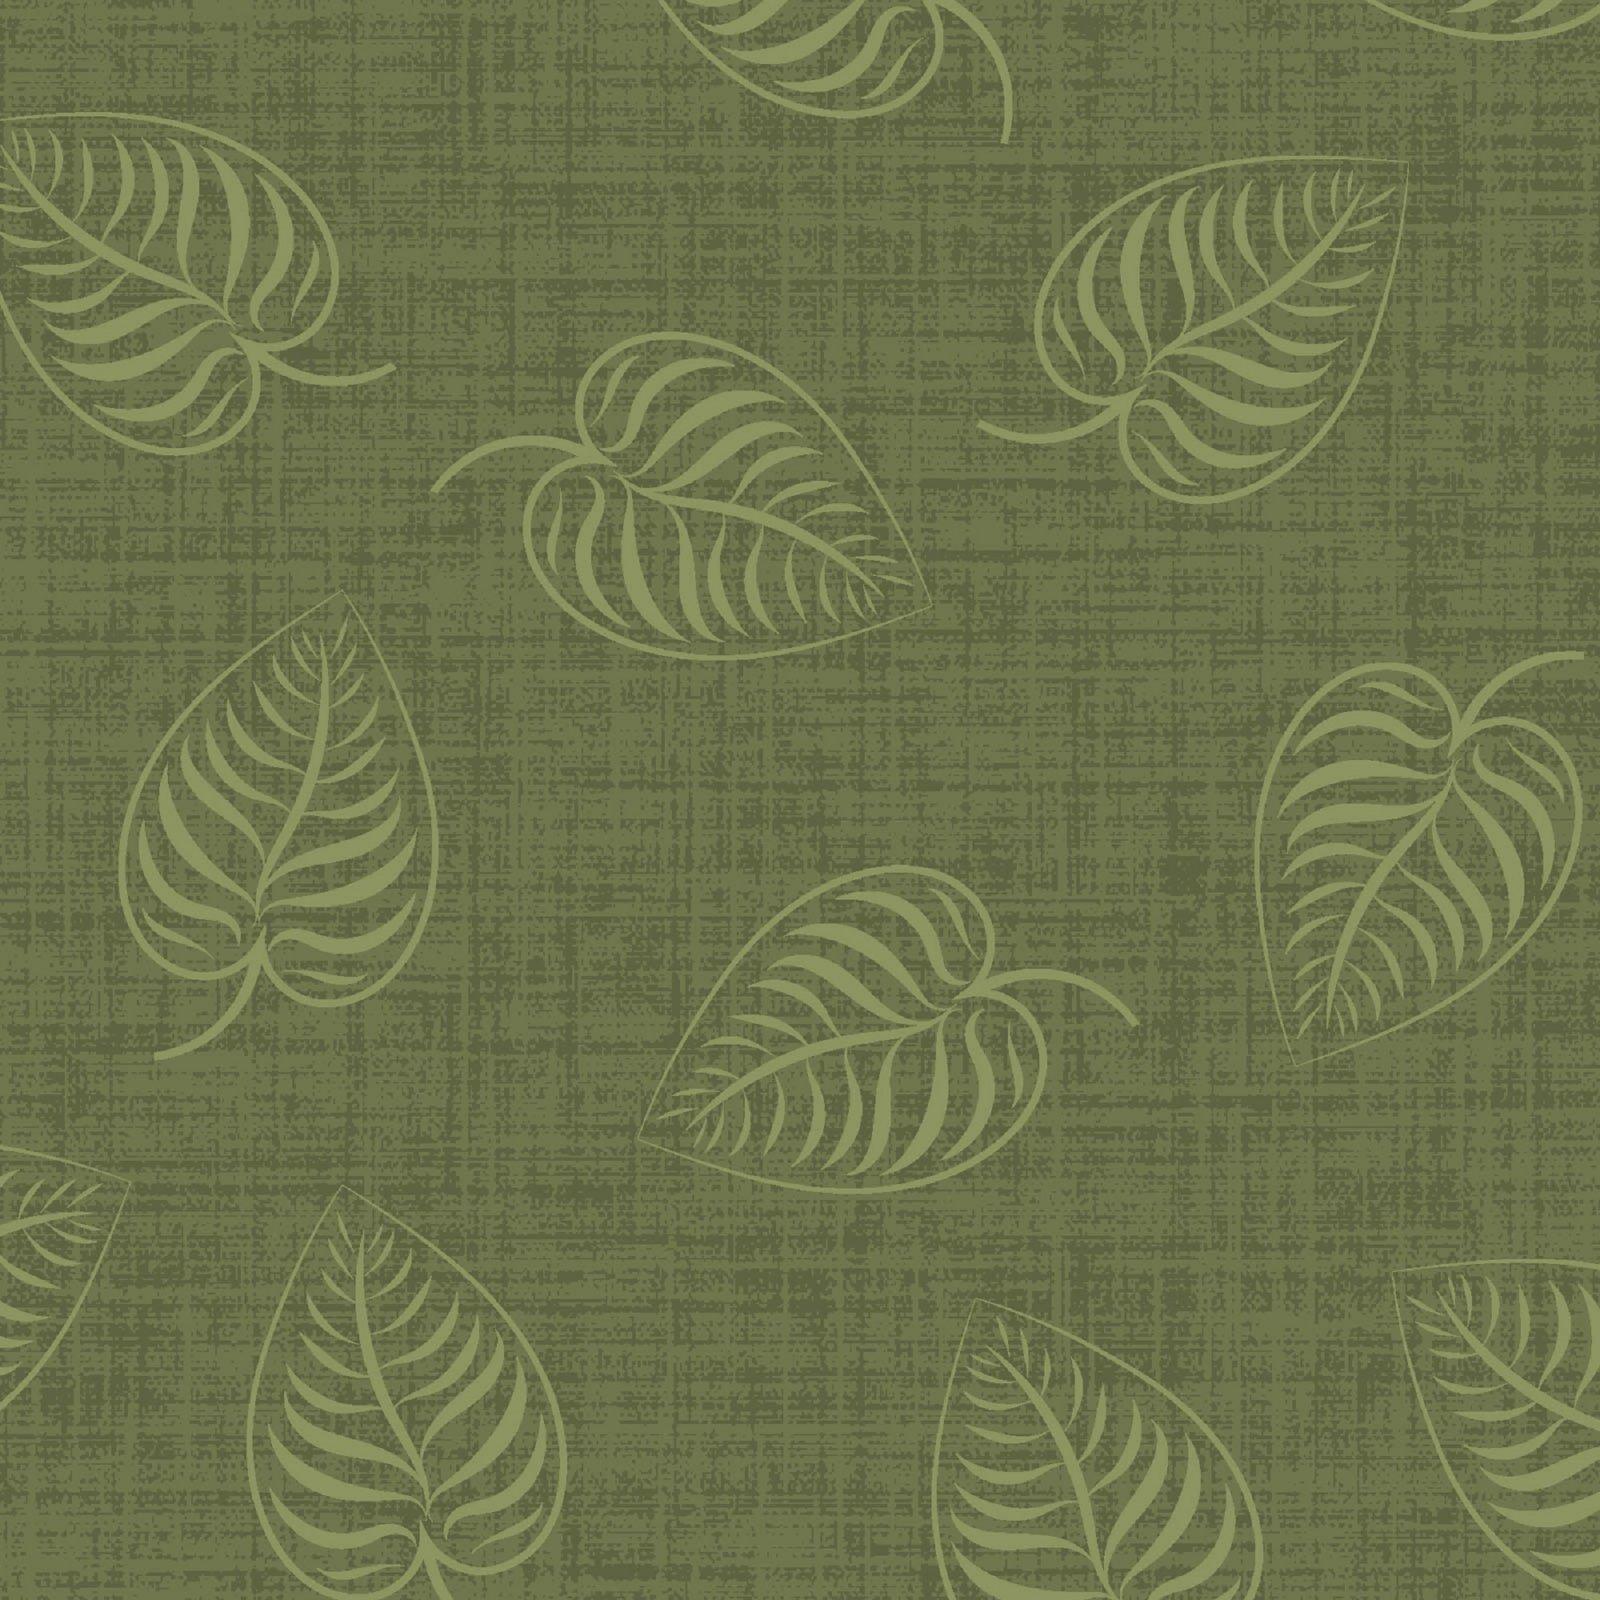 Flower & Vine - Leaf Print - Green